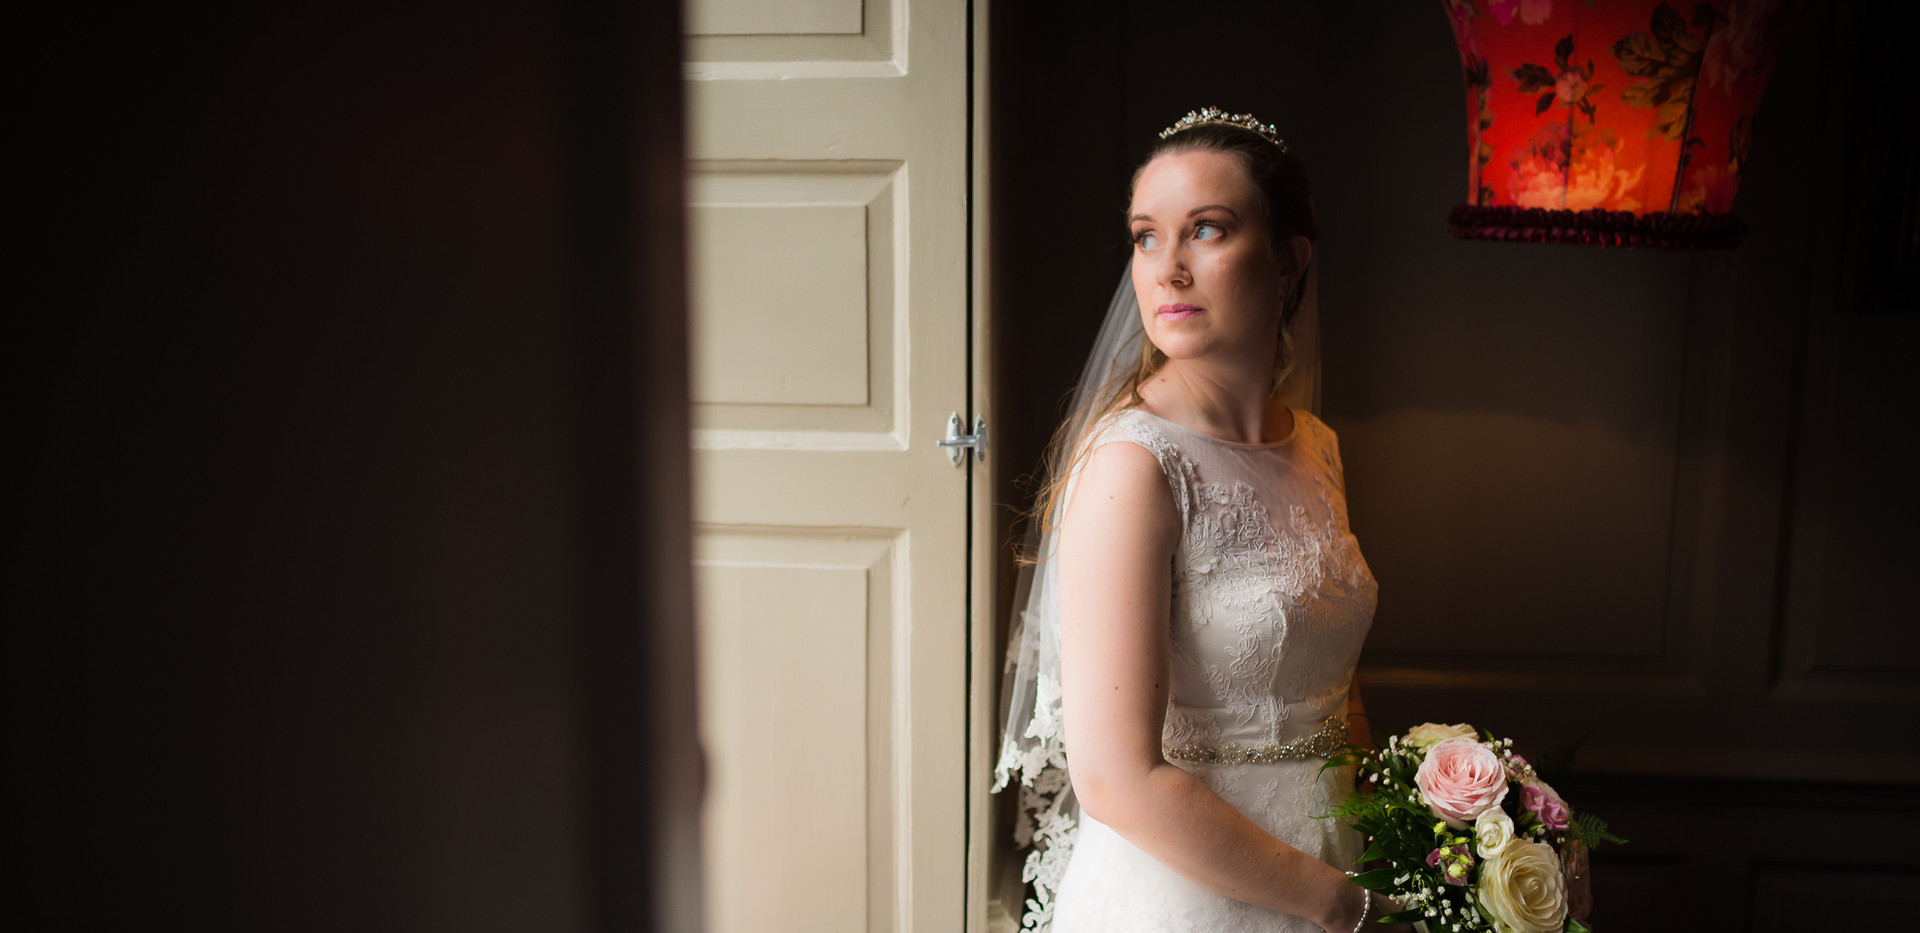 Oddfellows Wedding Photography___17.jpg